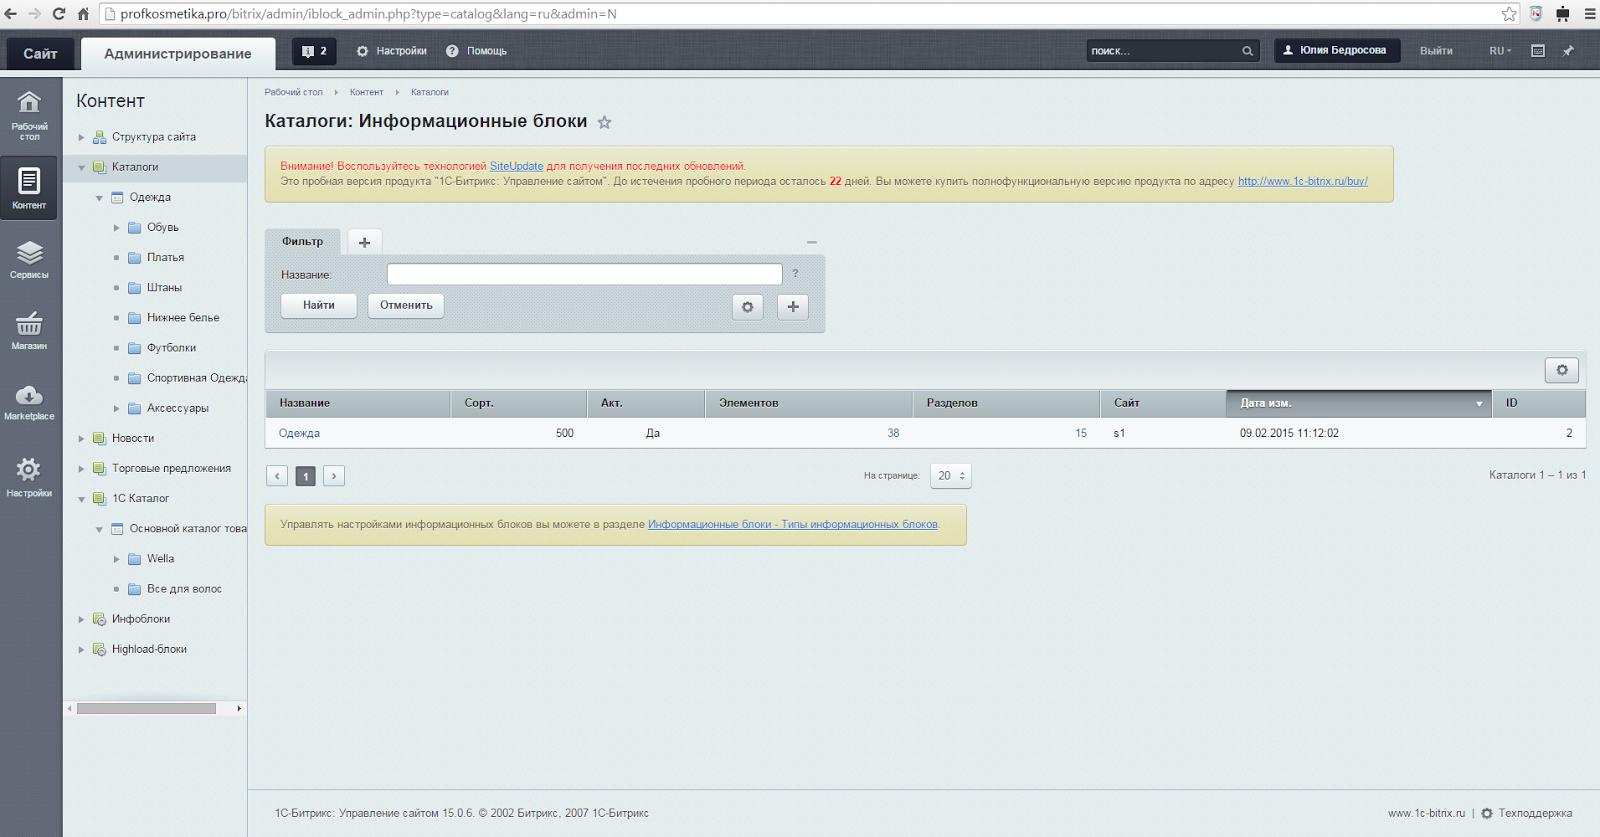 Импорт из 1с в битрикс каталогов пример создания сайта на 1с битрикс